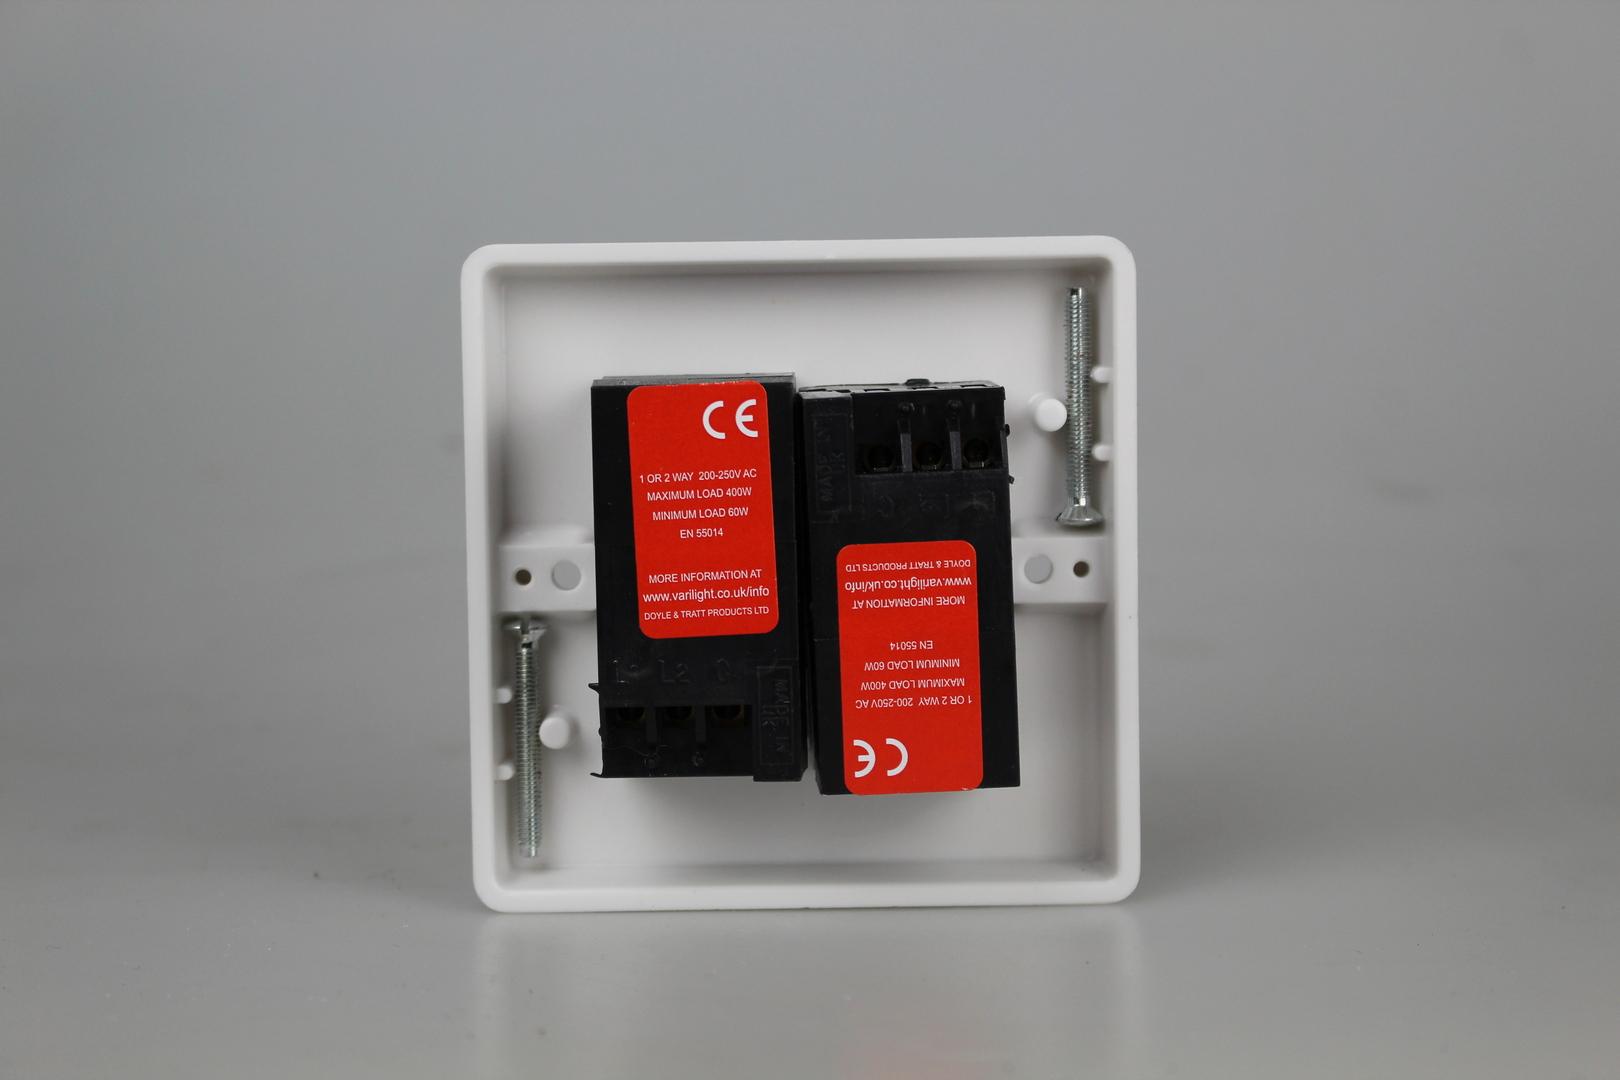 Varilight Product Data Sheet Hq83w Wiring Instructions Durable White Plastic